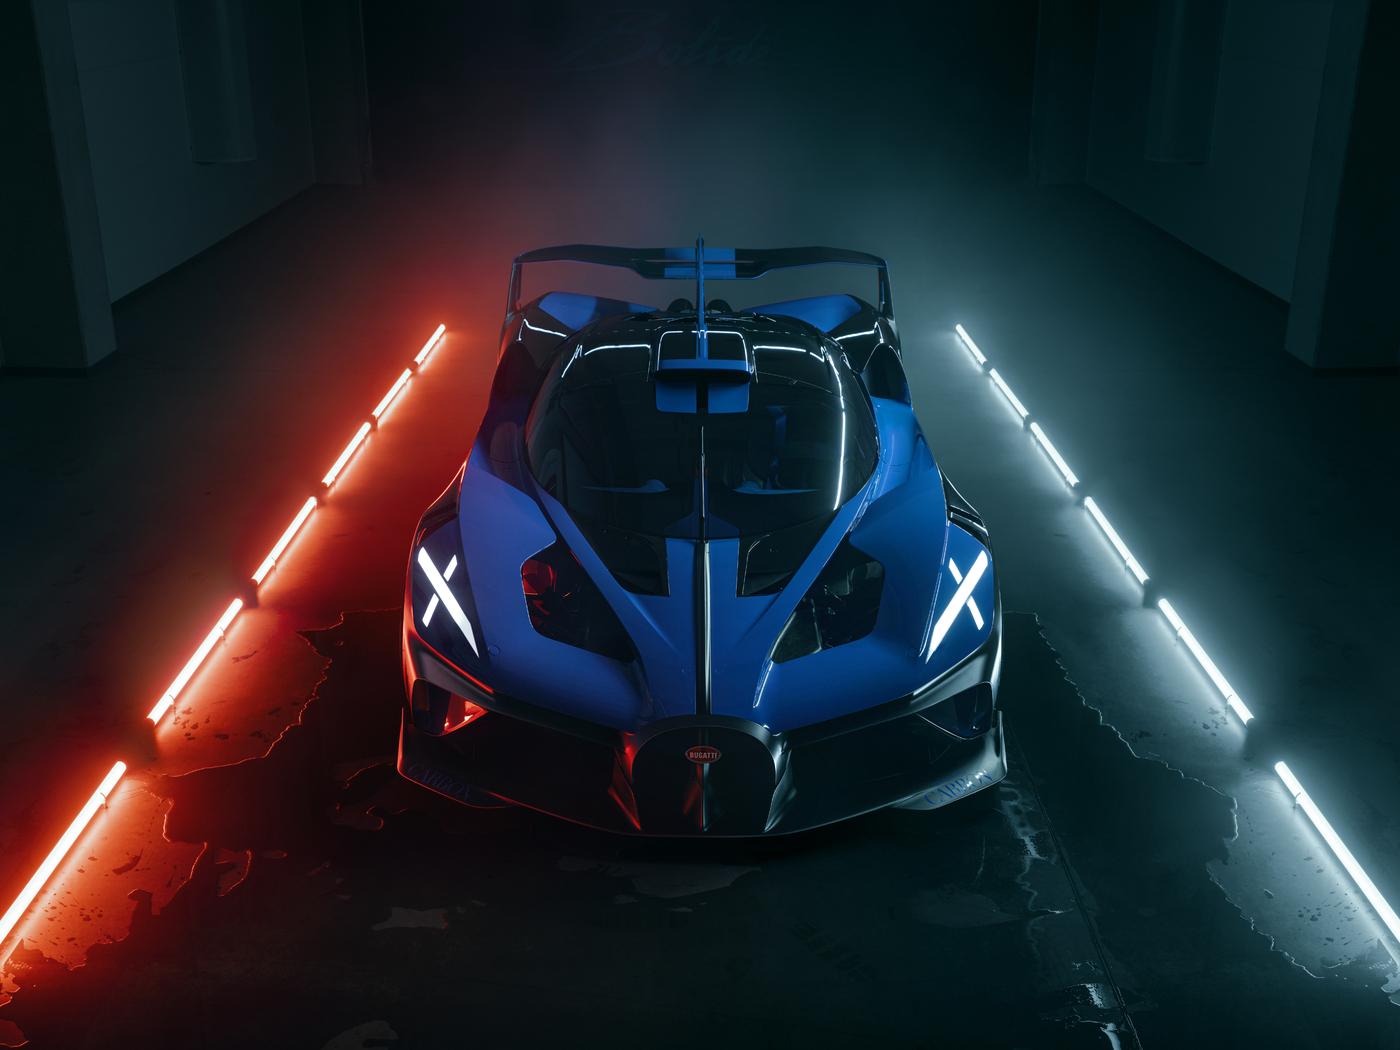 10k-bugatti-bolide-2021-3k.jpg